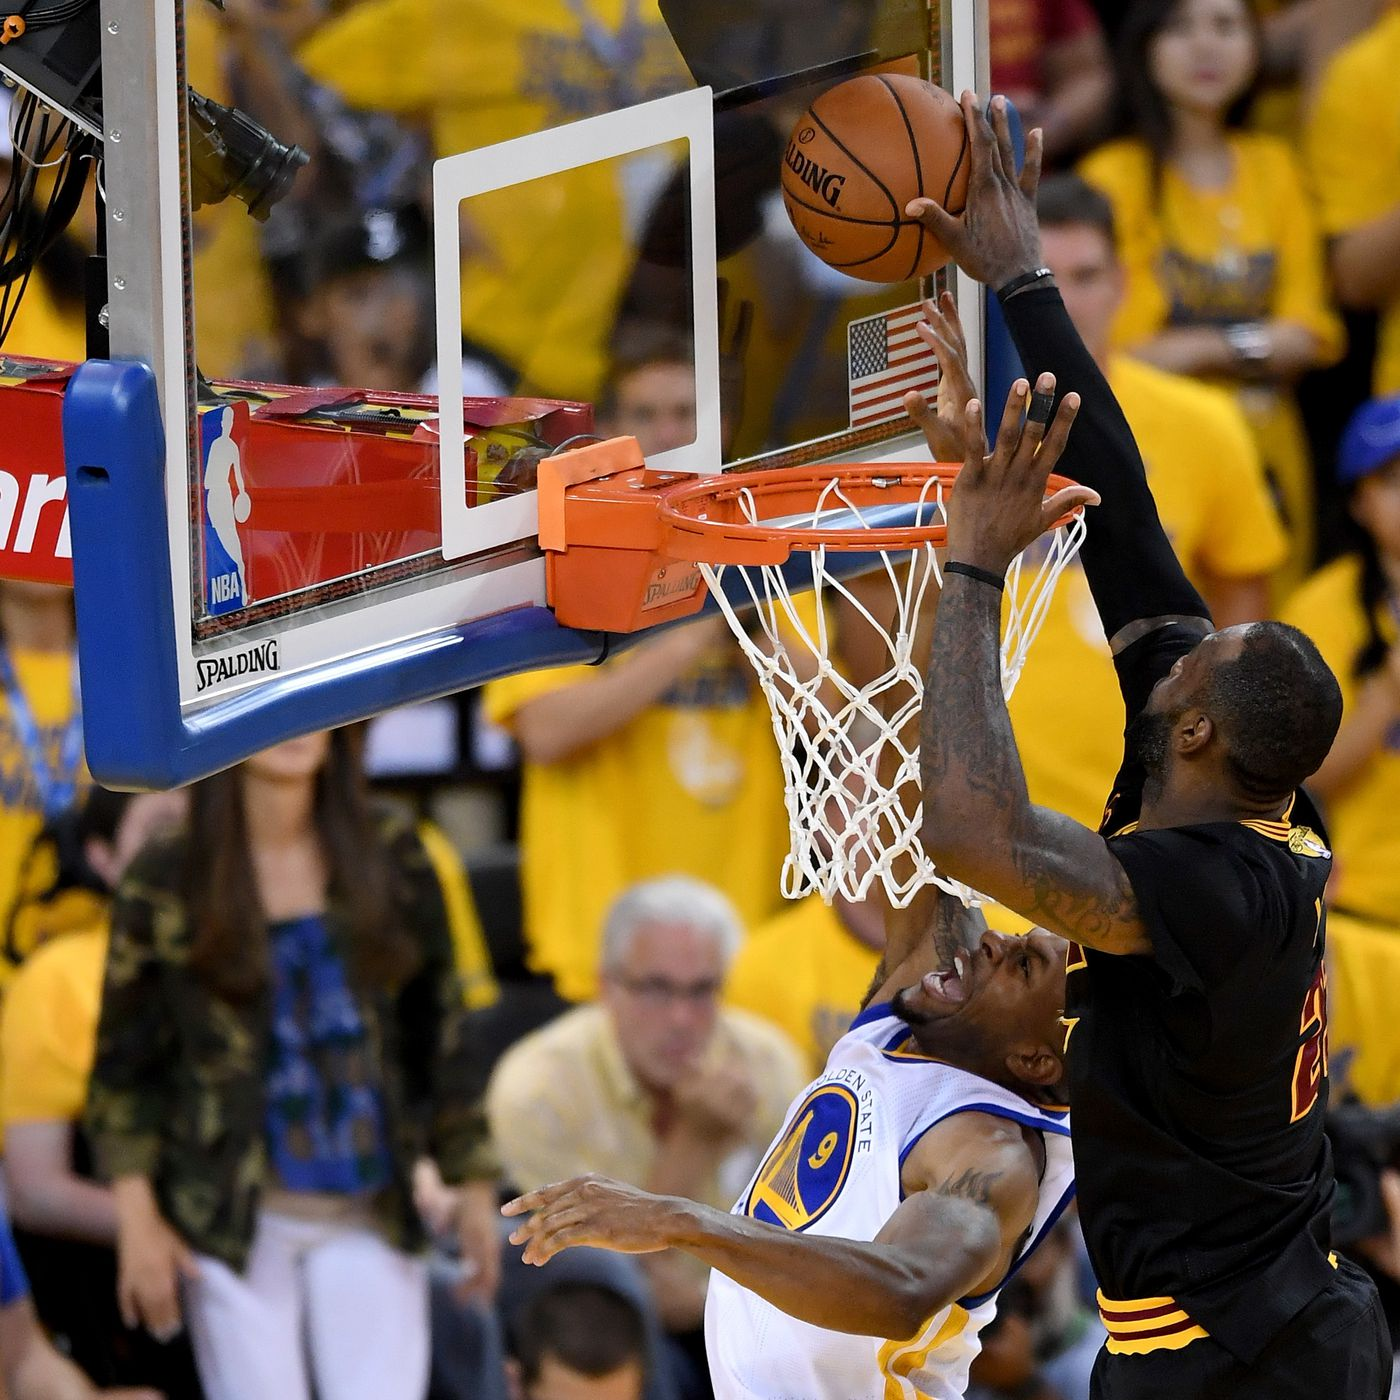 98ff153ff557 LeBron's block on Andre Iguodala was the NBA Finals' perfect ending -  SBNation.com